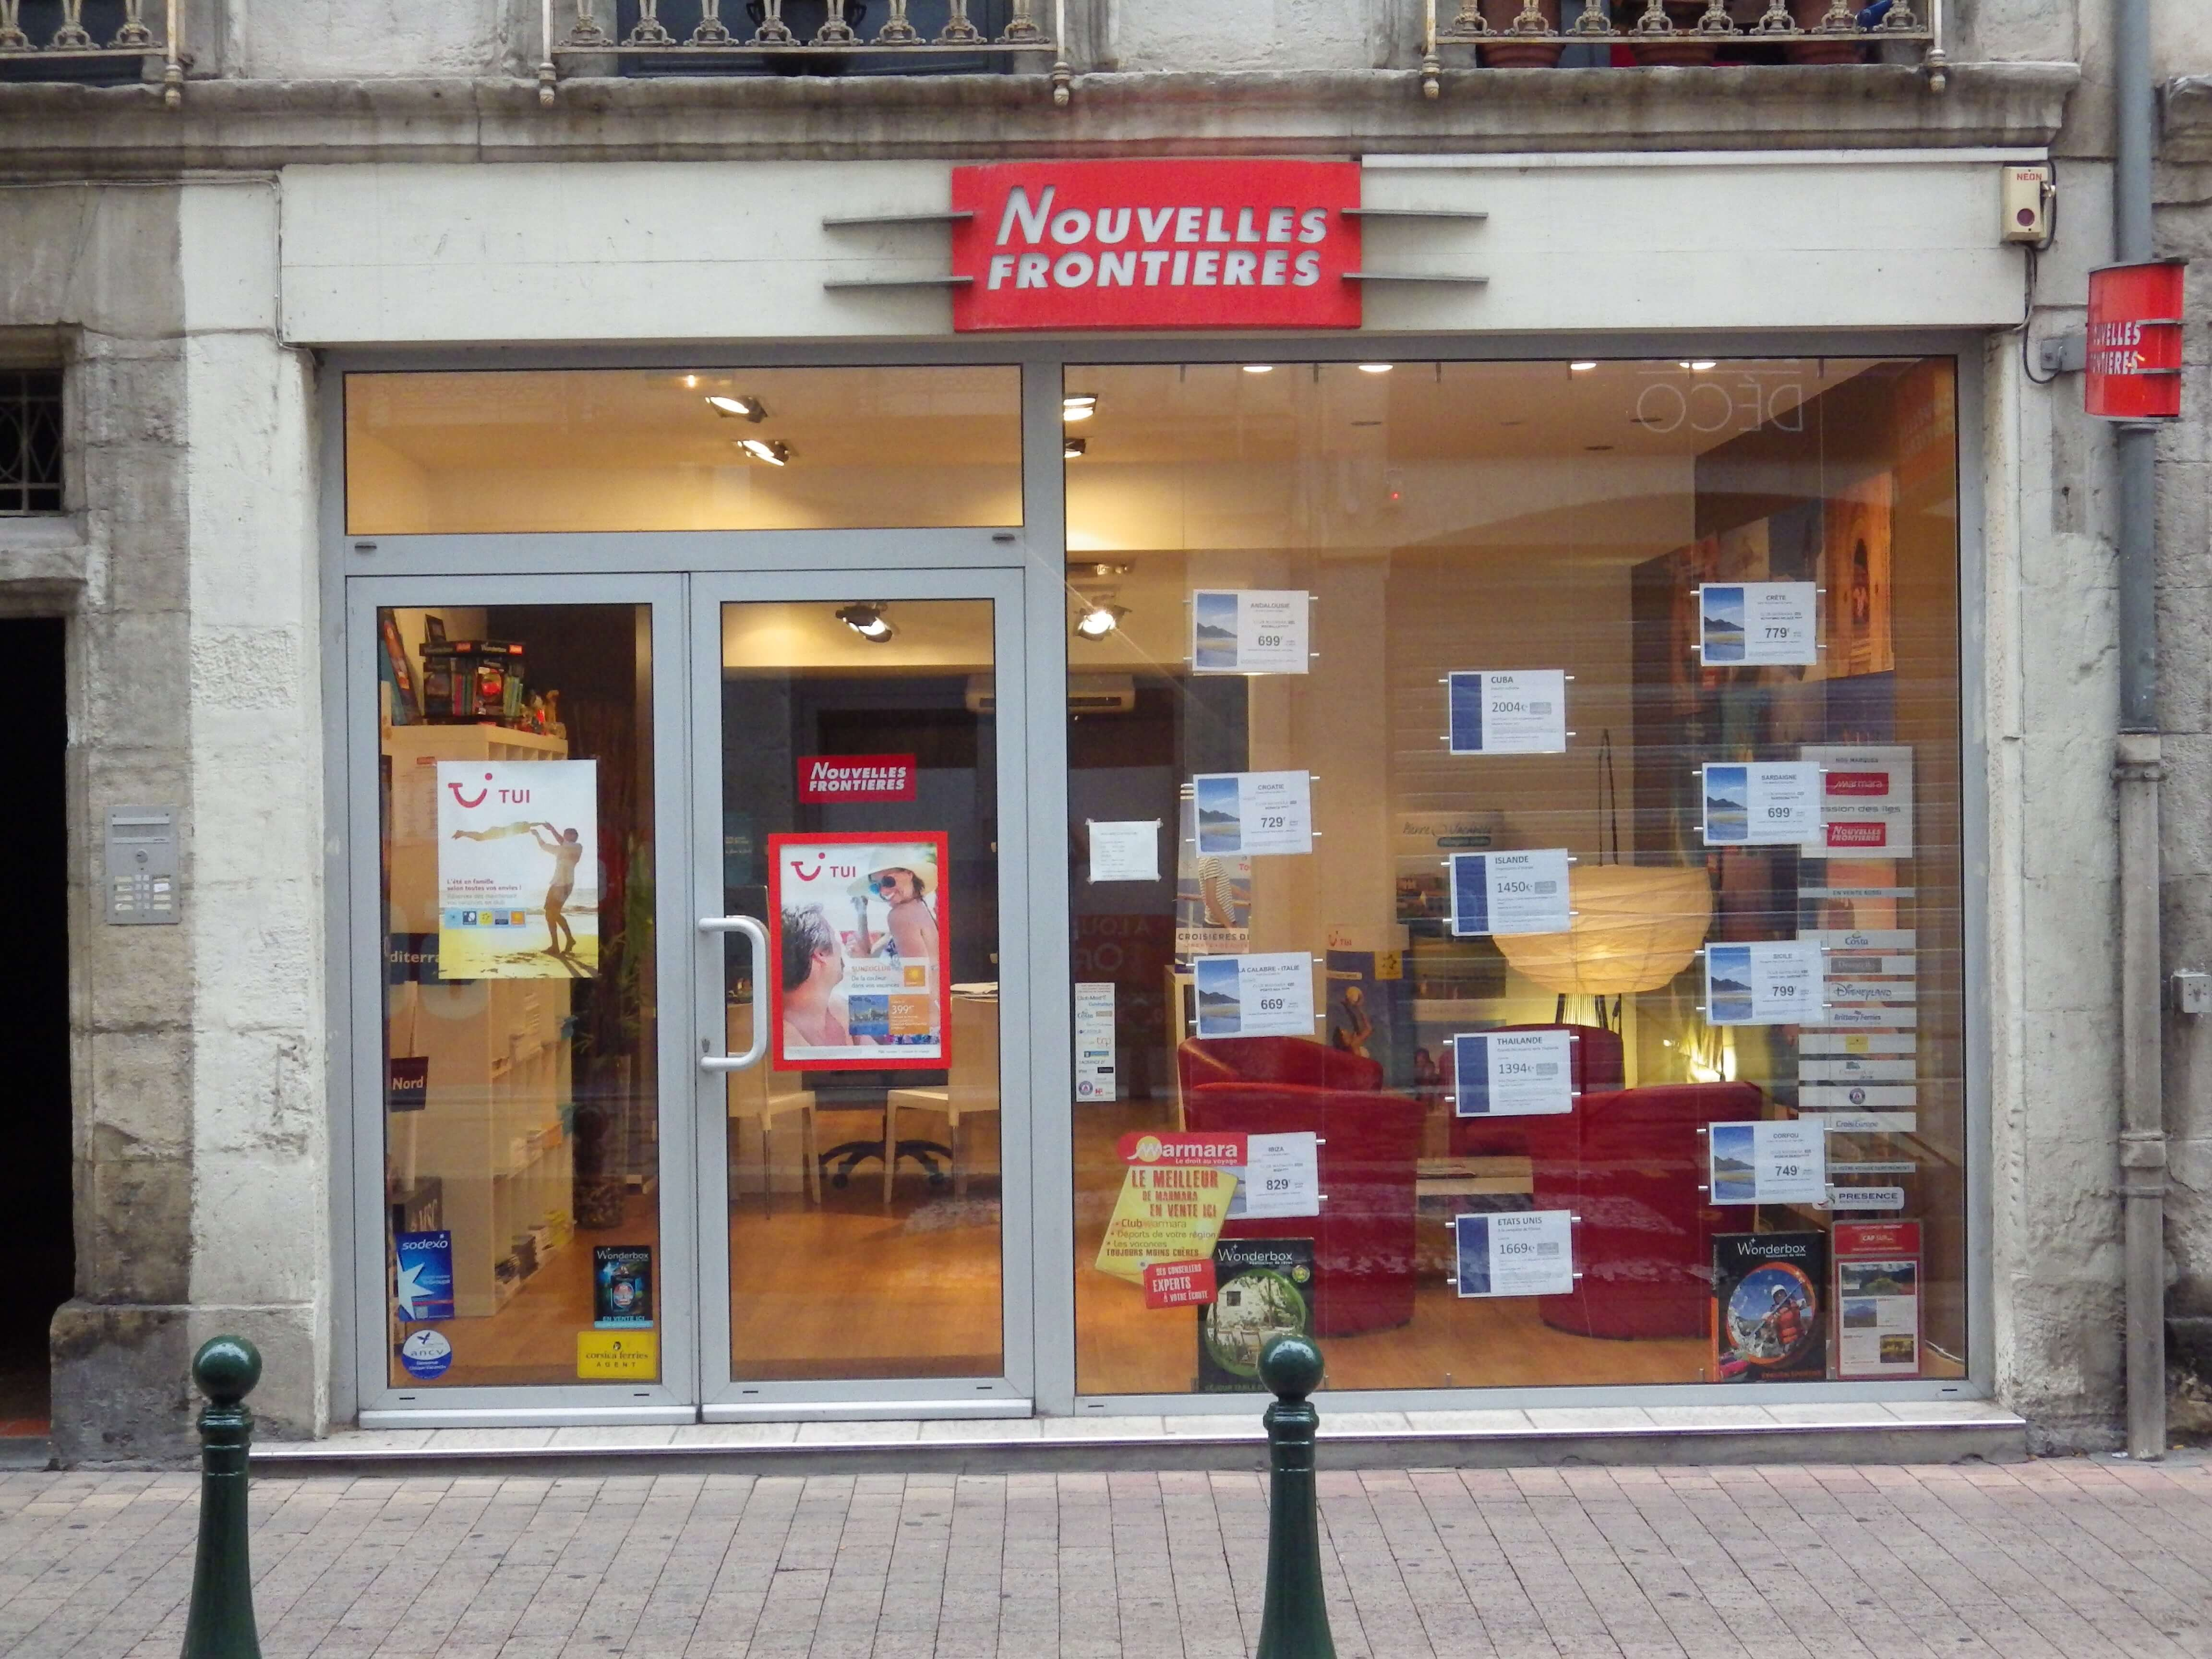 Agence de voyages nouvelles fronti res castres tui for Agence nouvelle frontiere